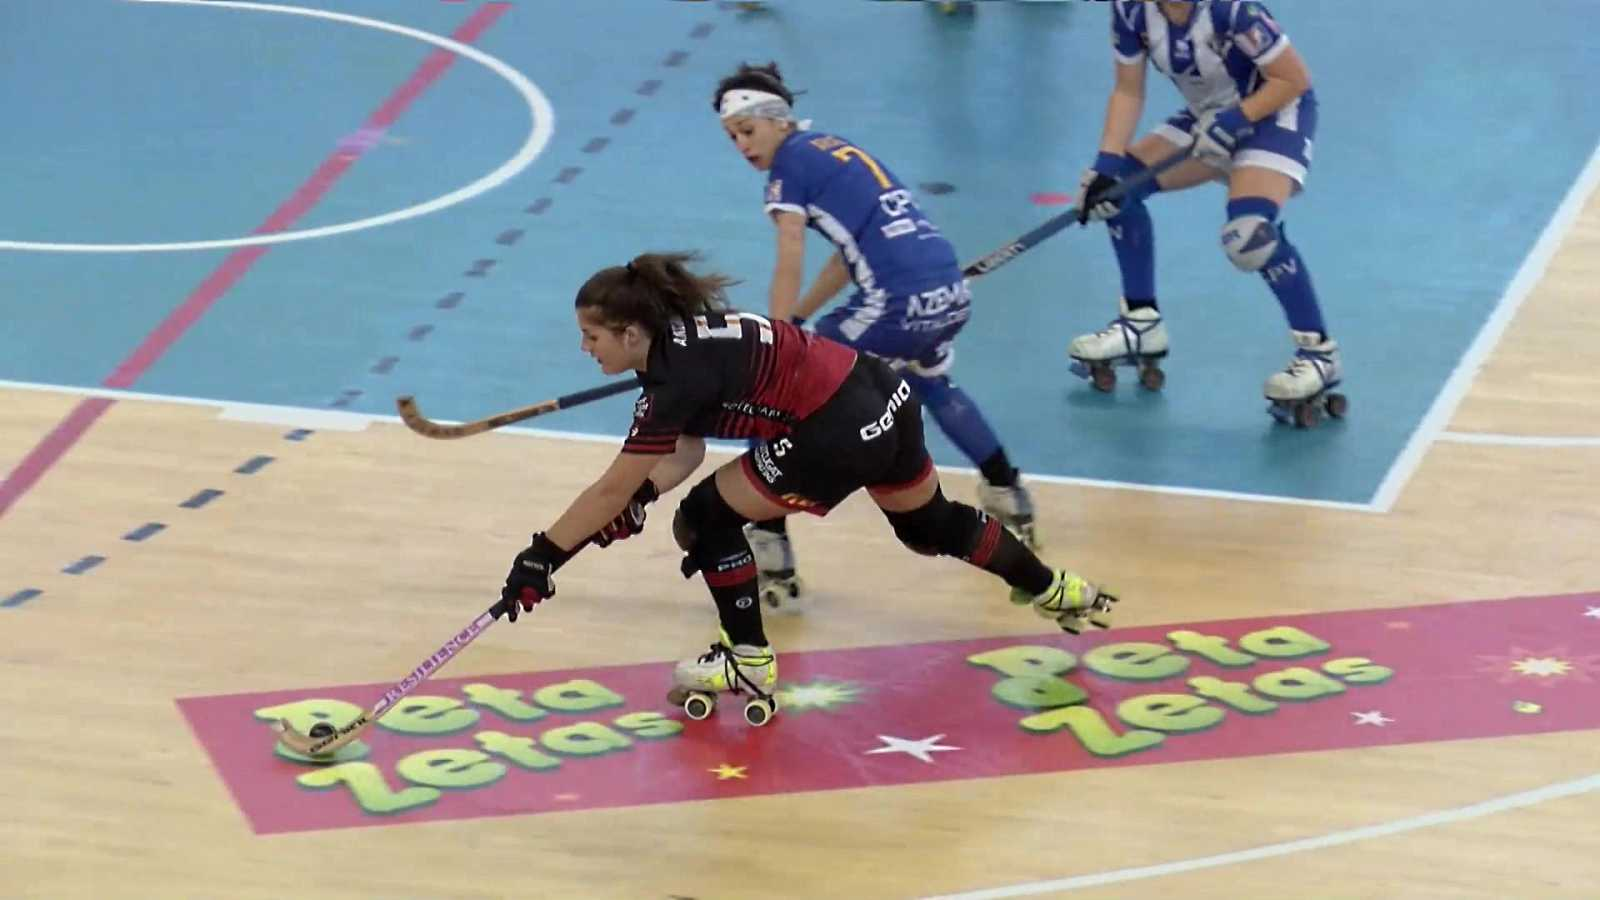 Hockey patines - Copa del Rey. 1/4 final: CP Voltregá Stern-Motor - PHC Sant Cugat - ver ahora